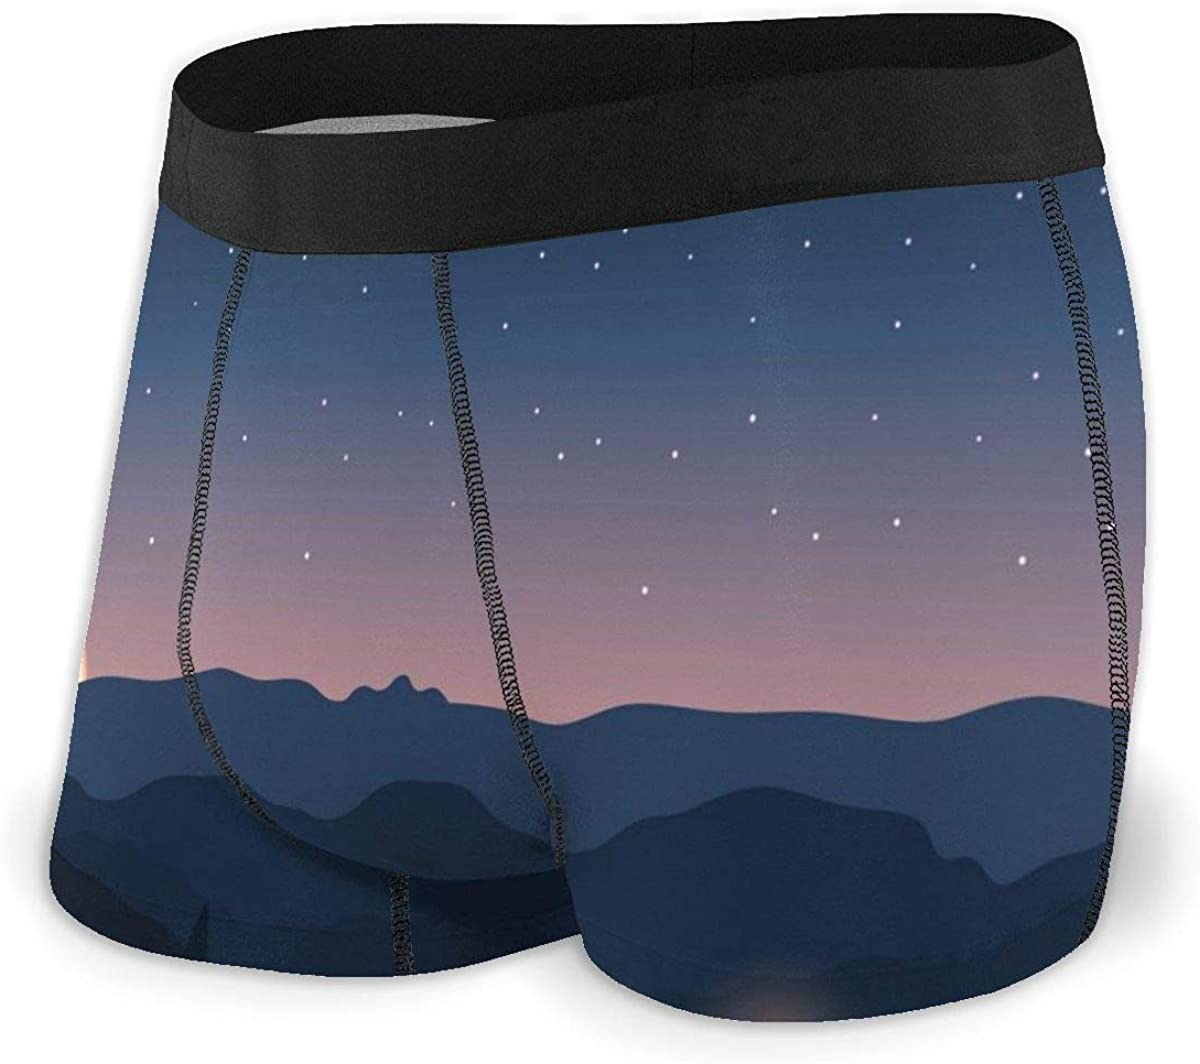 Mens Boxer Briefs Starry Sky Mountain and Light Moon Landscape Bikini Underwear Stretch Low Rise Trunks Boys Underpants